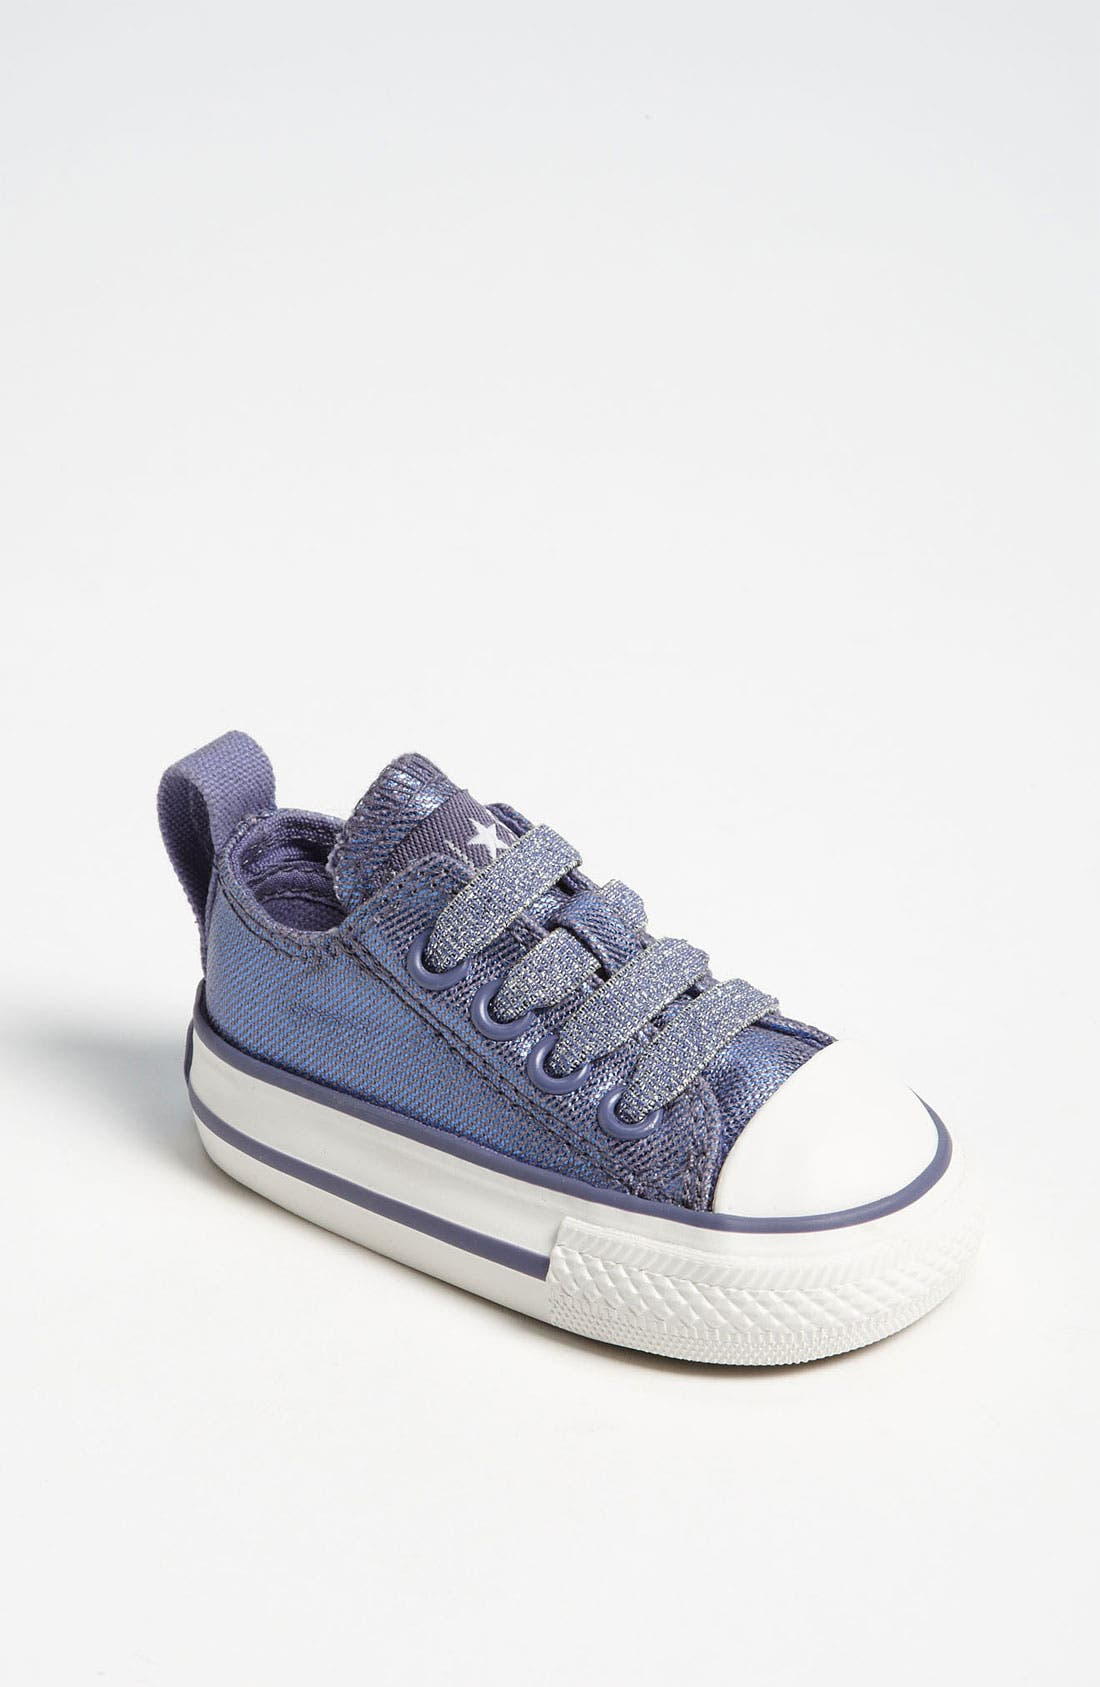 Alternate Image 1 Selected - Converse 'Shimmer' Slip-On Sneaker (Baby, Walker, Toddler, Little Kid & Big Kid)